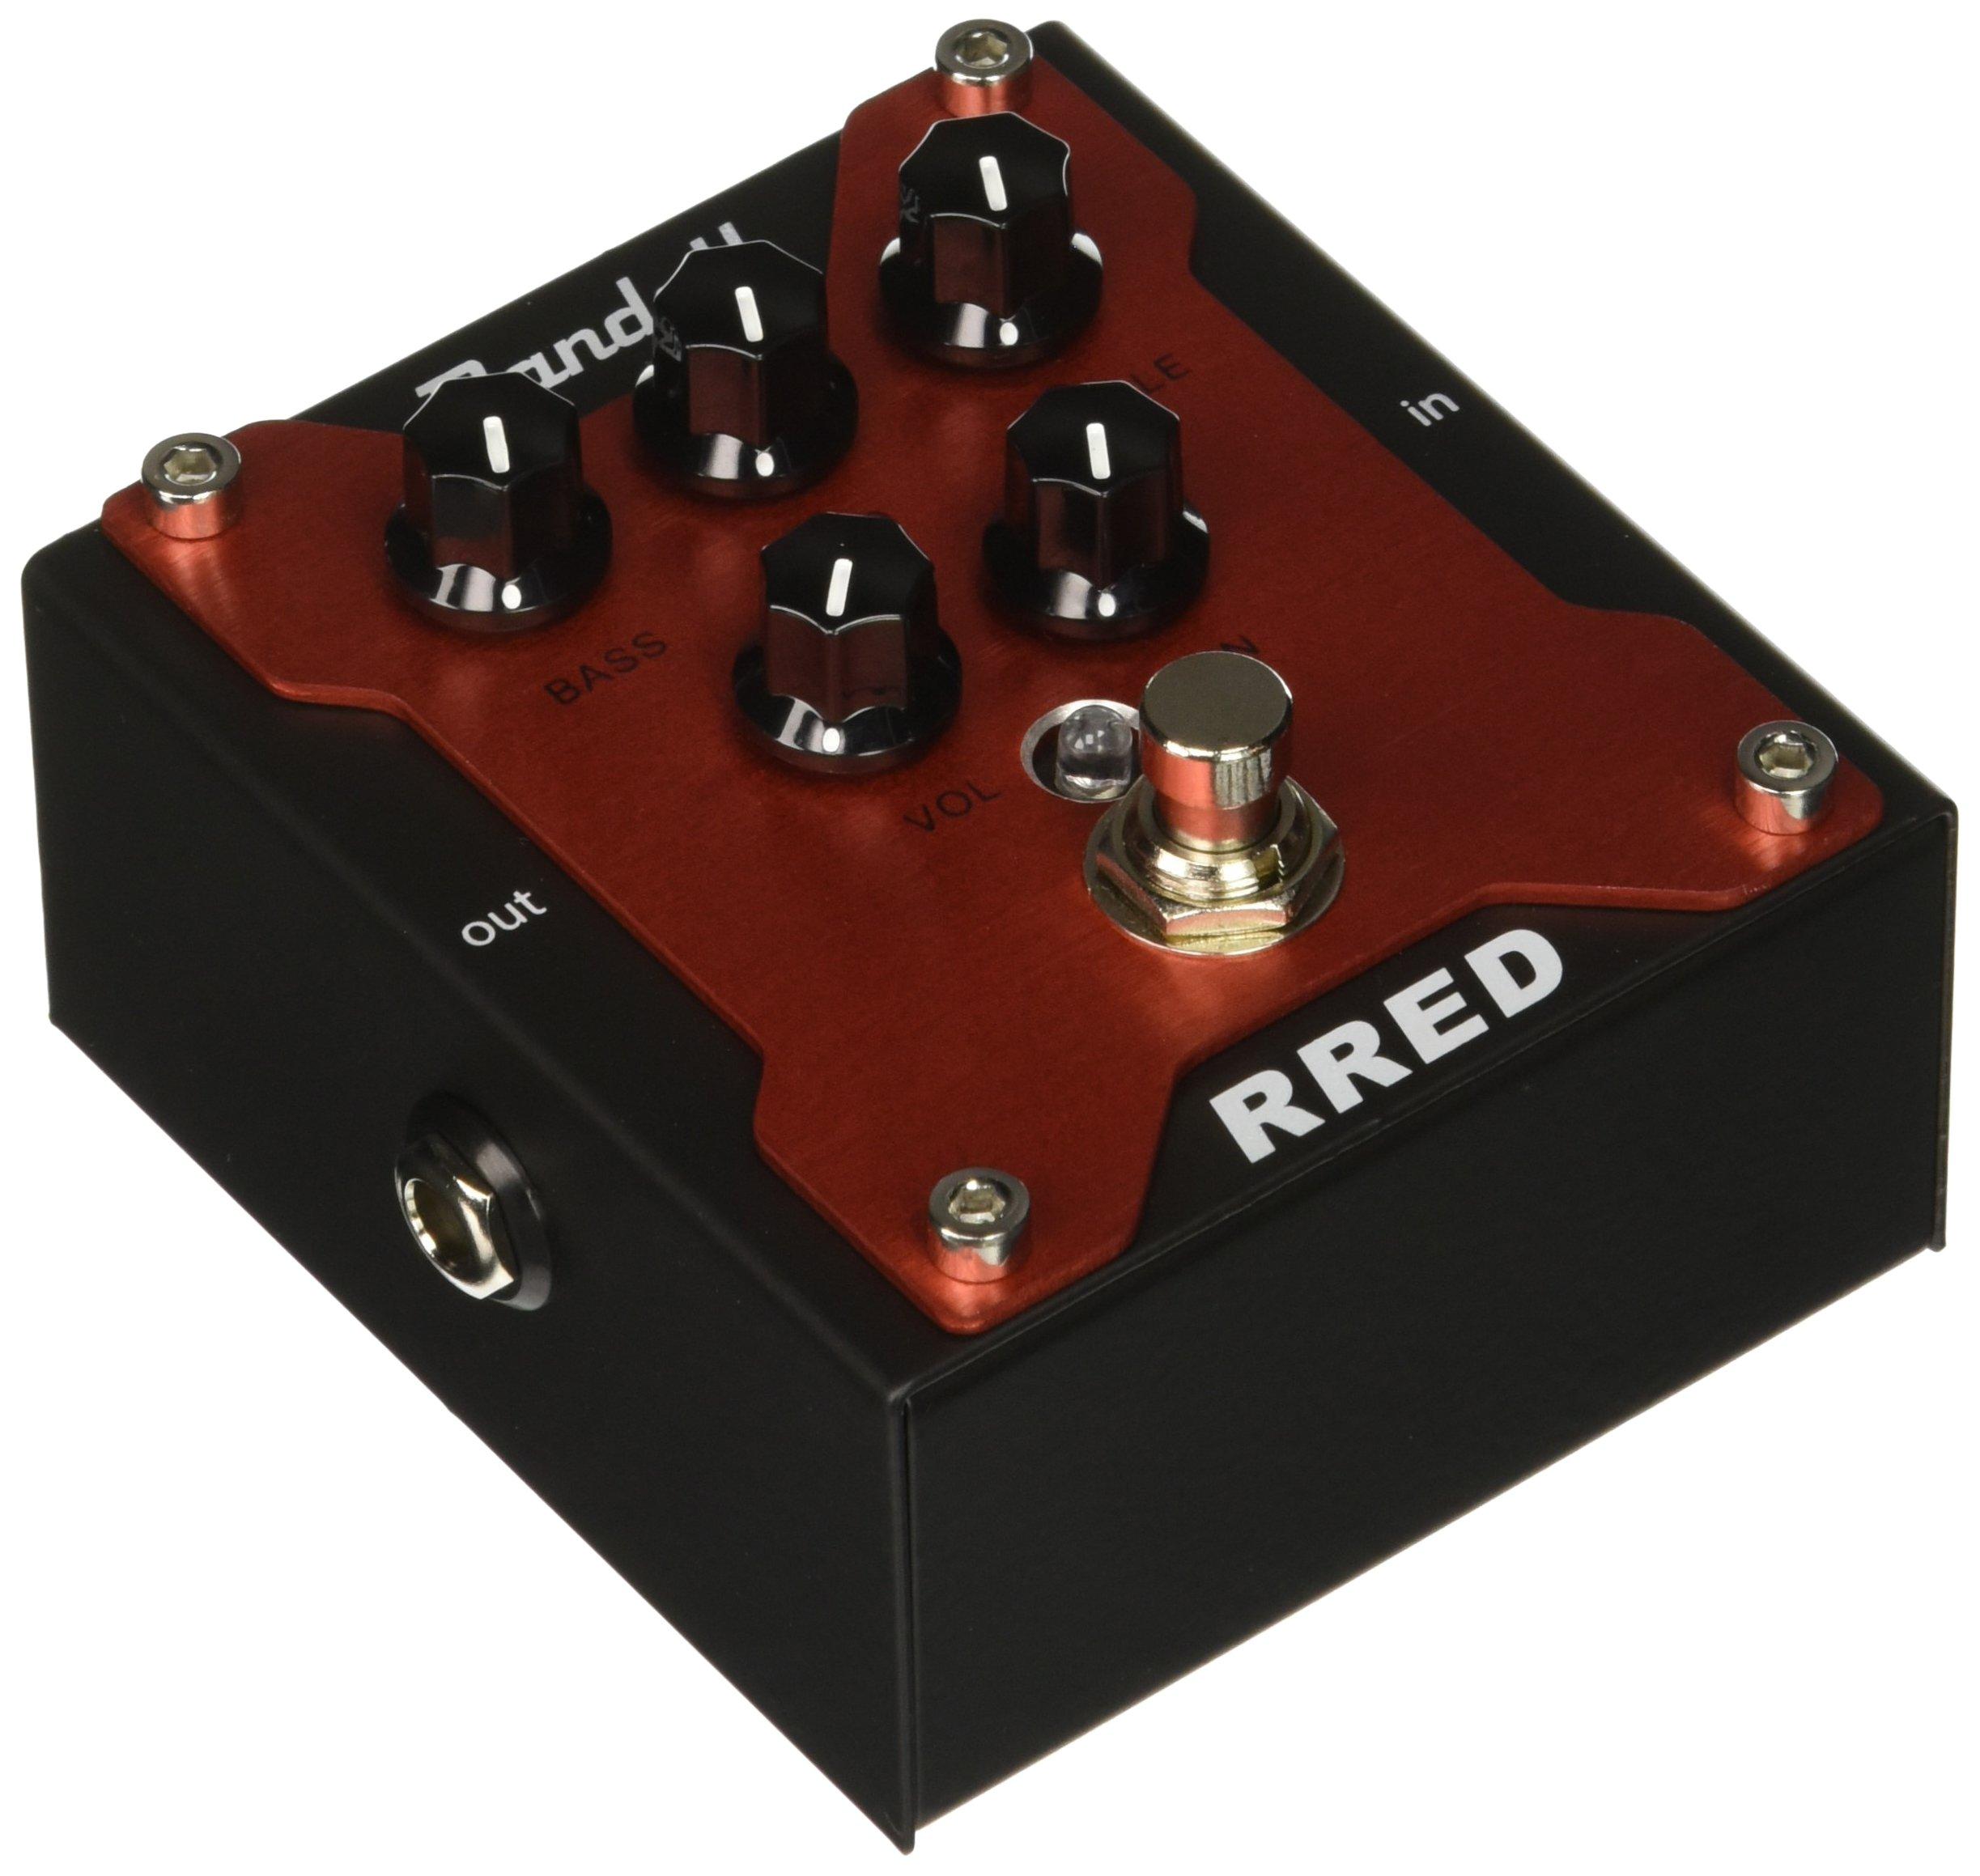 Randall RRED Classic  FET Distortion